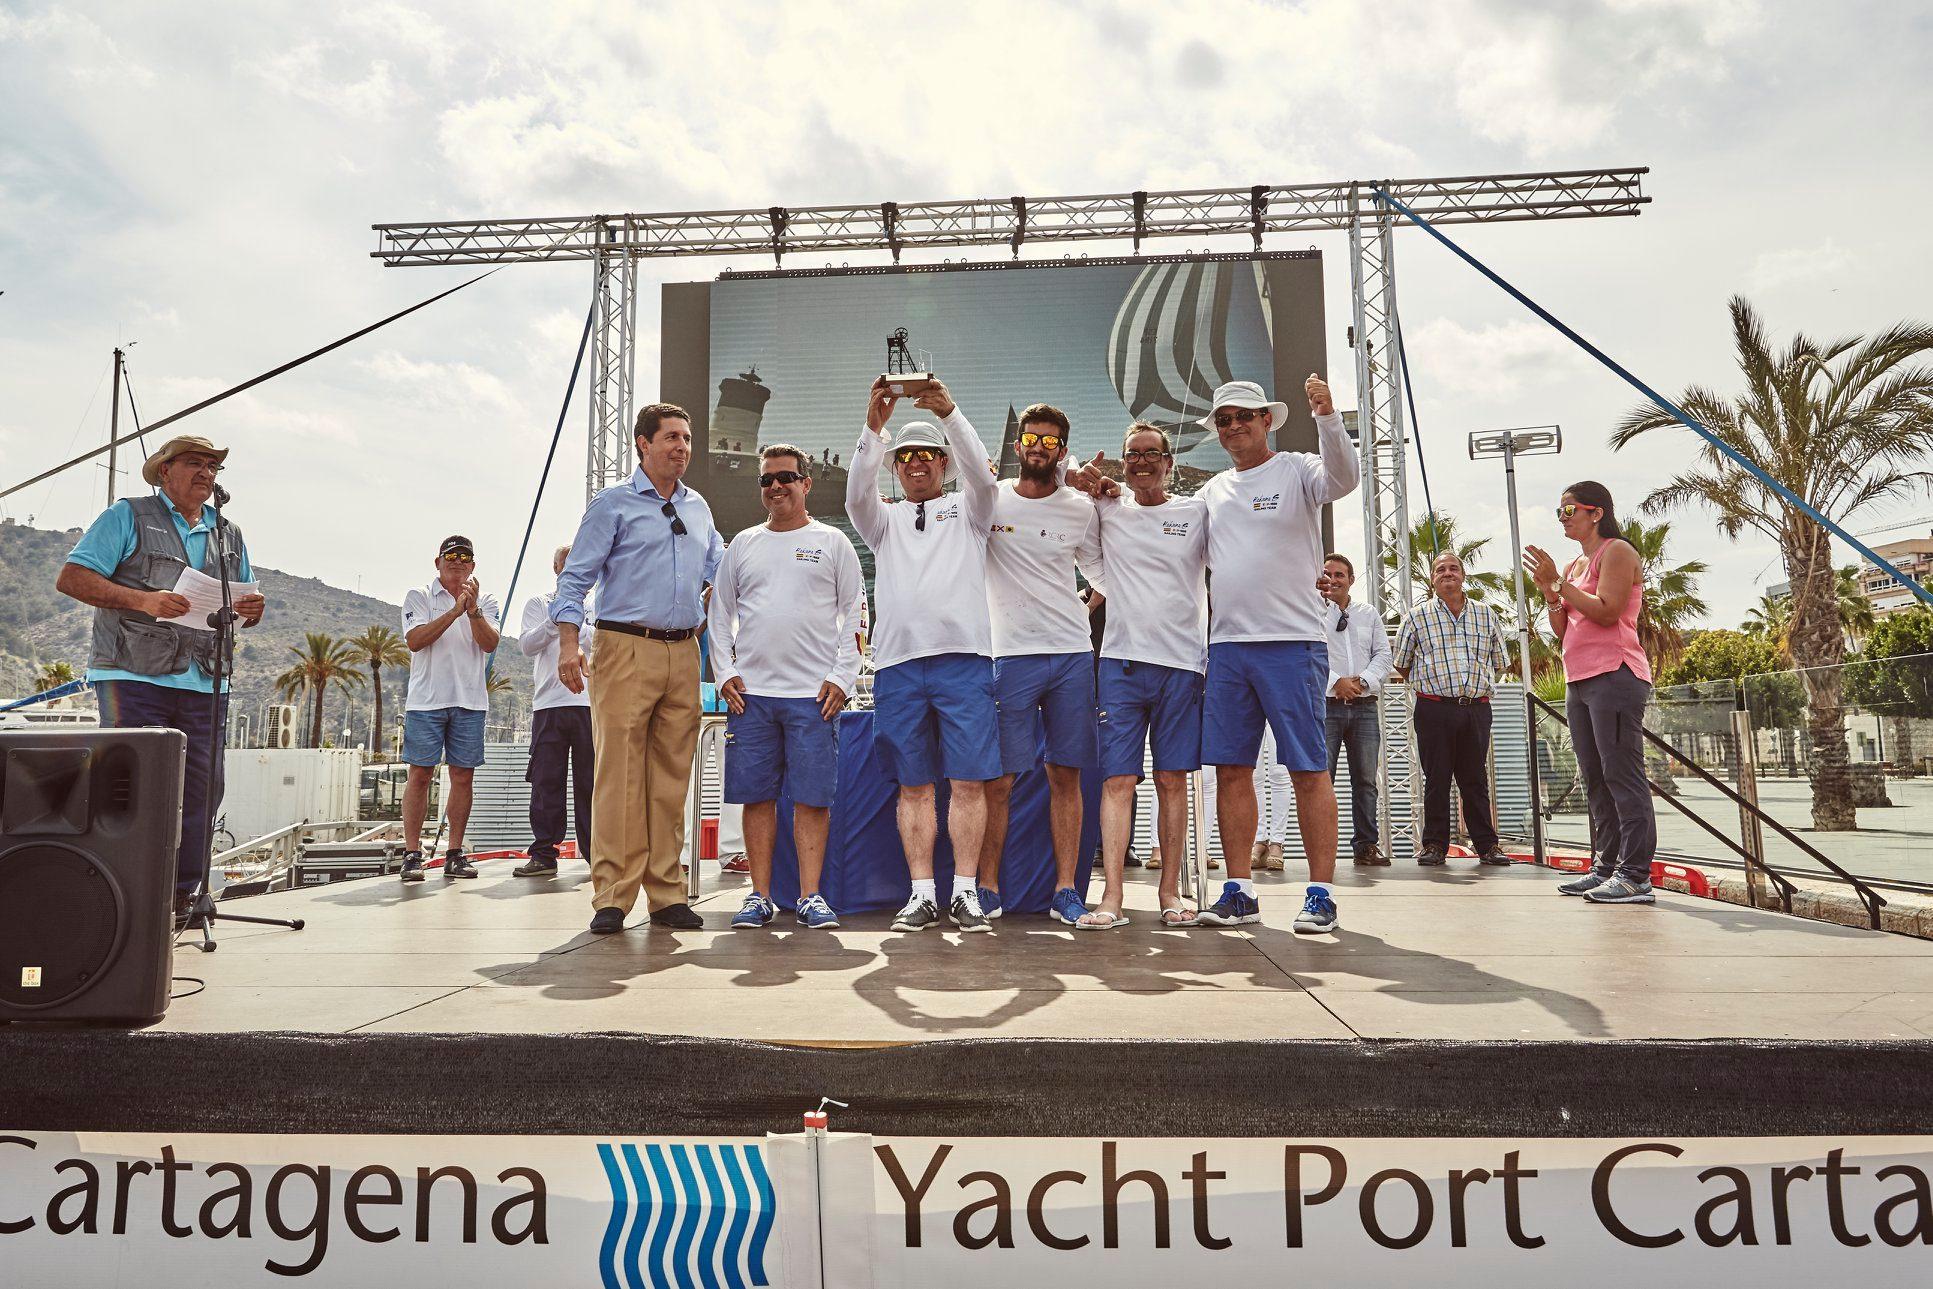 Agradecimiento a Yacht Port Cartagena